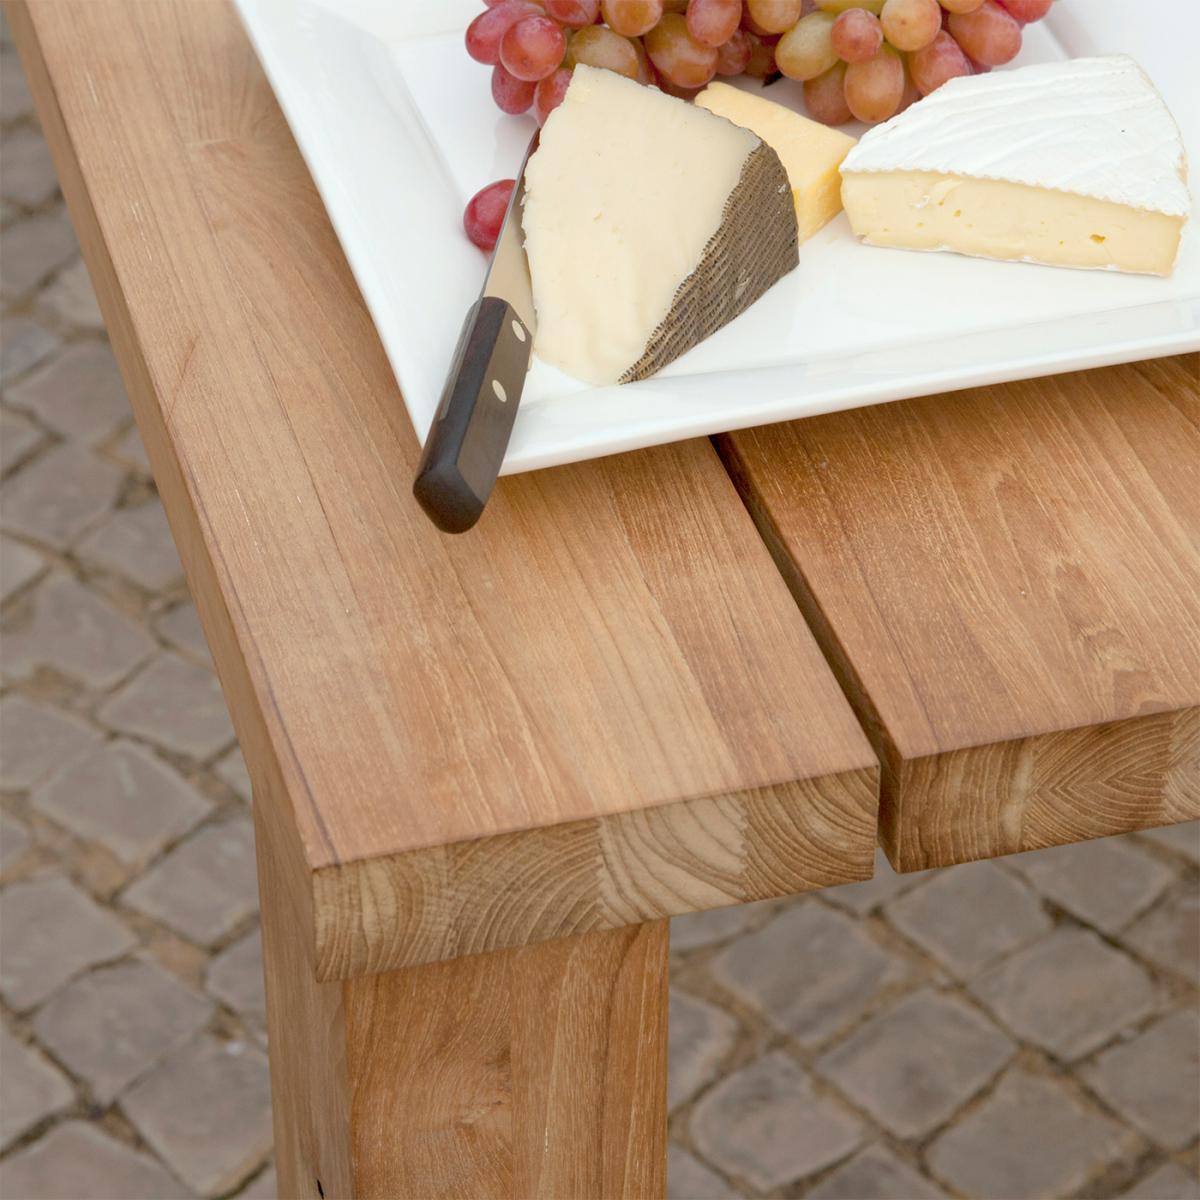 View The Full Image Clifton Nurseries Barlow Tyrie Titan Outdoor Hardwood  Teak Dining Table